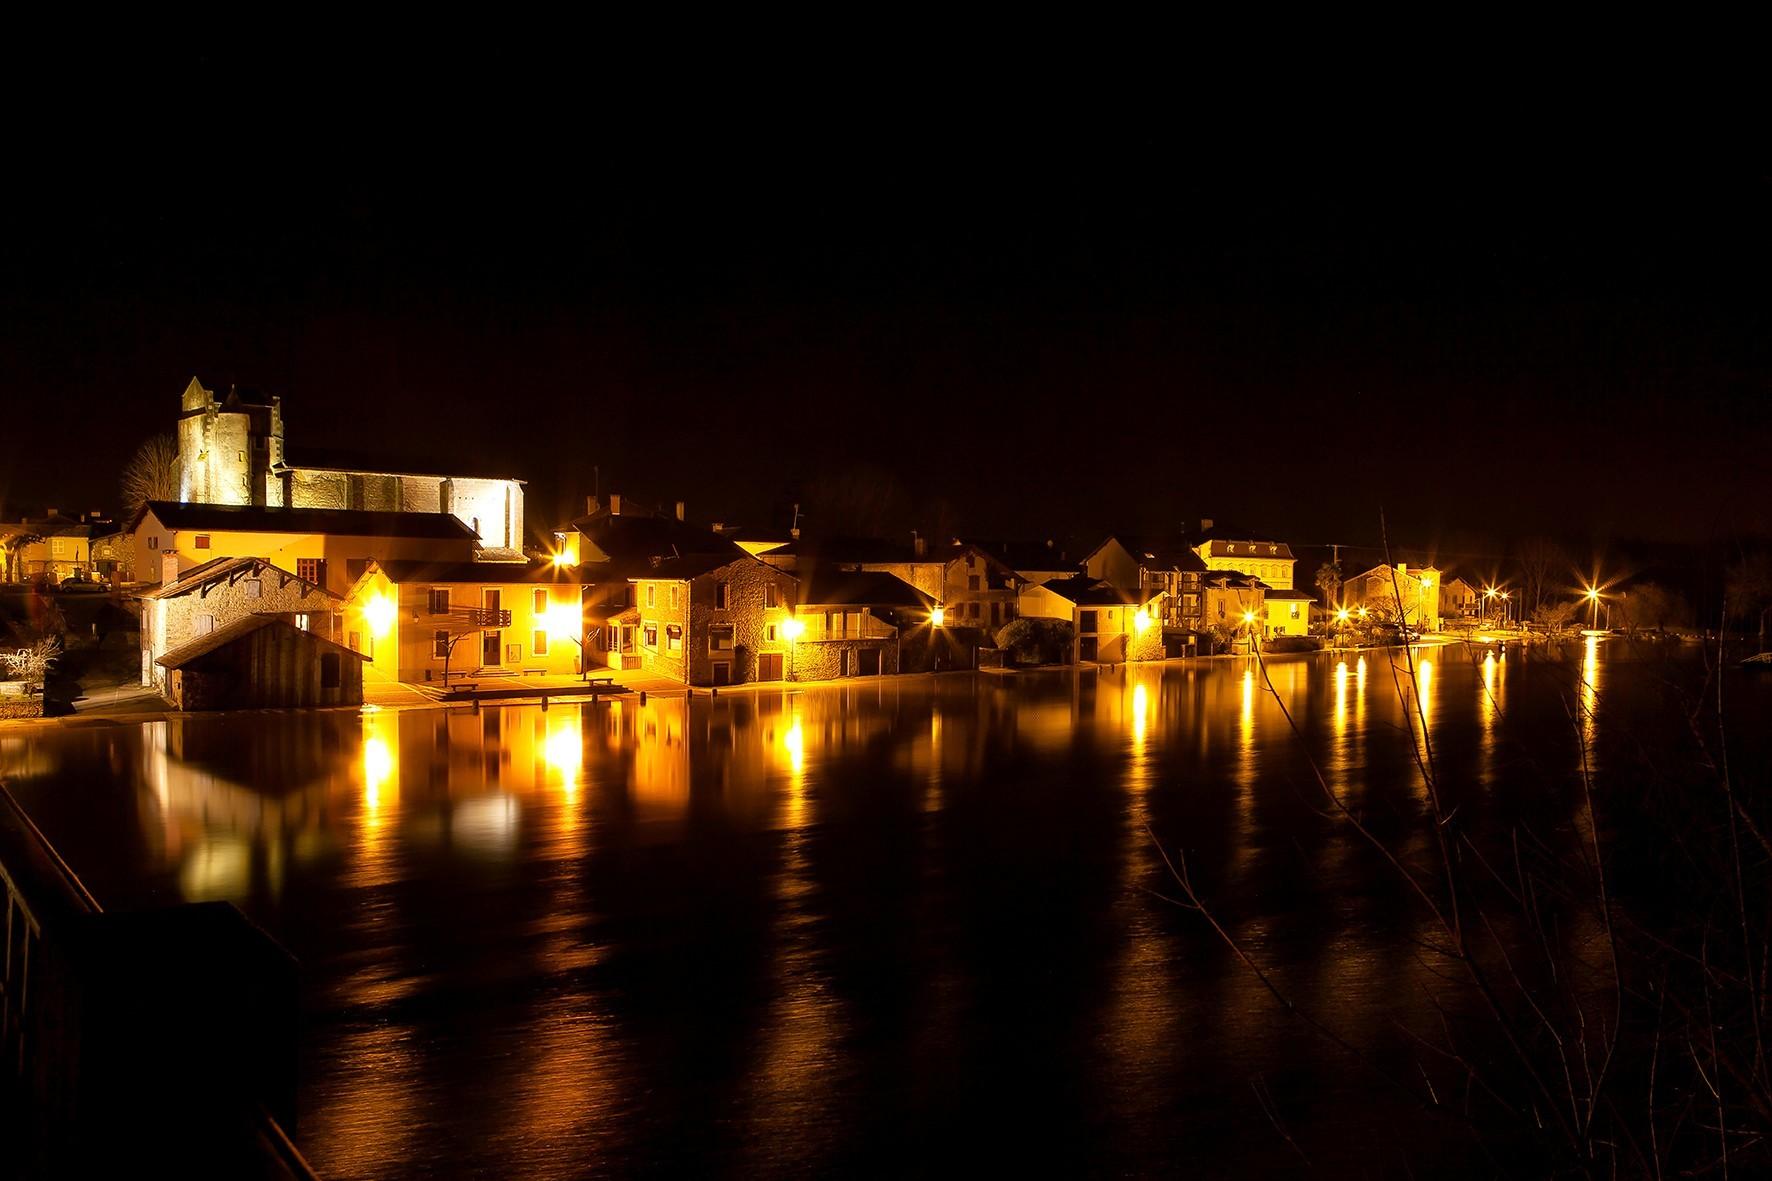 Saubusse by night